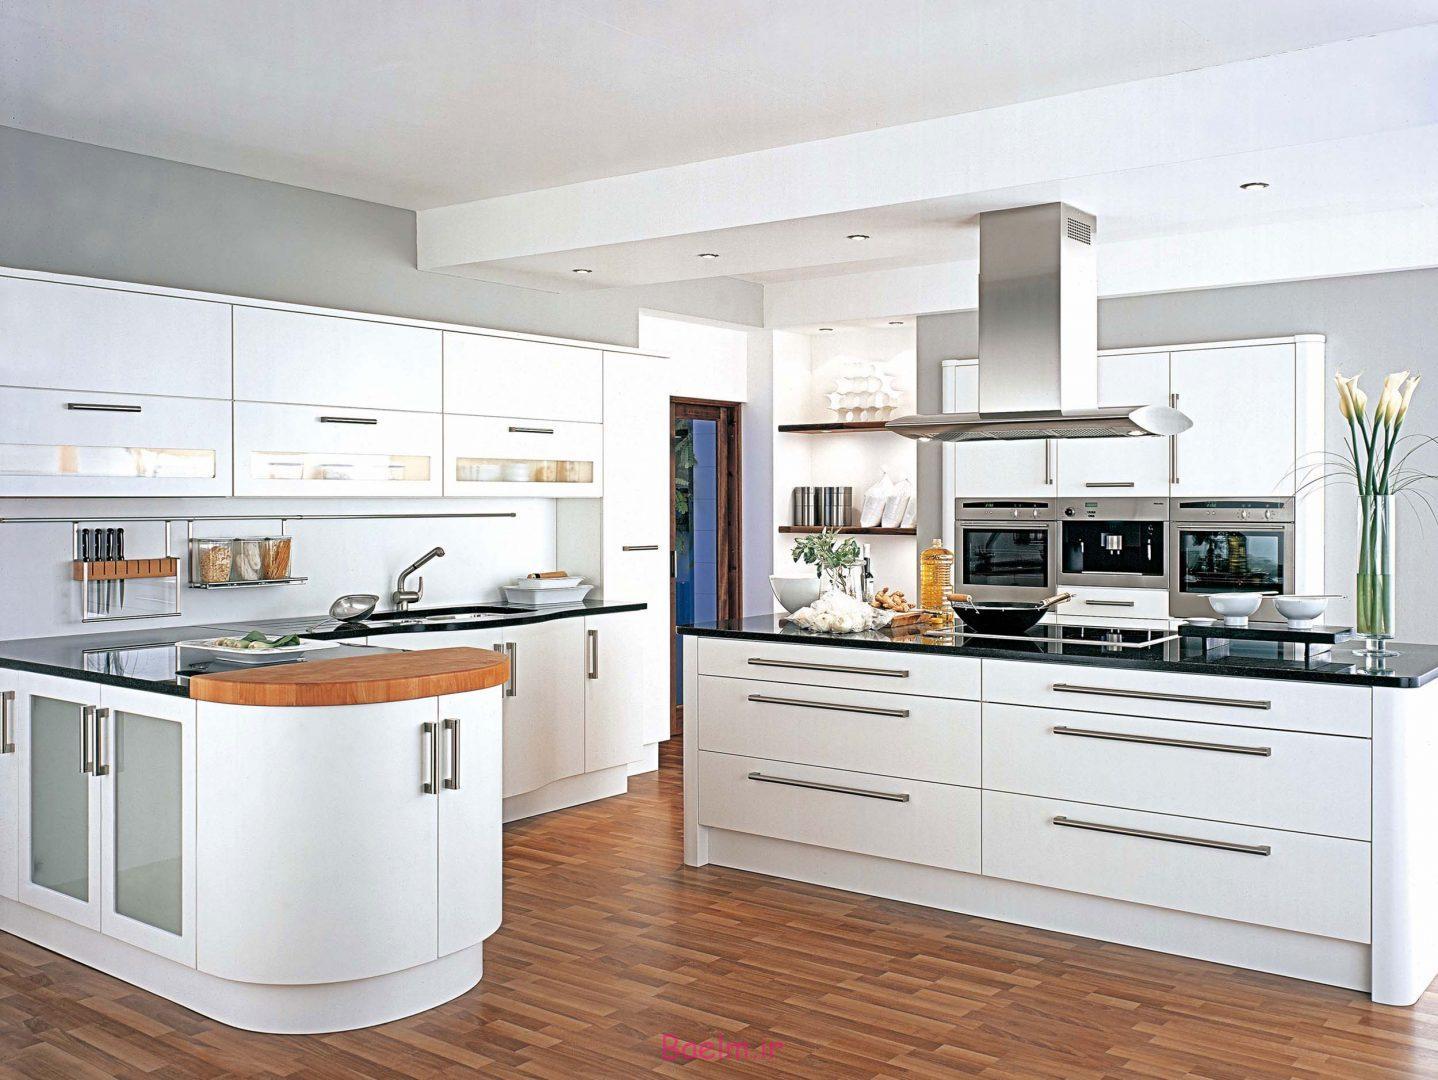 kitchen remodel ideas 22 Kitchen Remodel Ideas